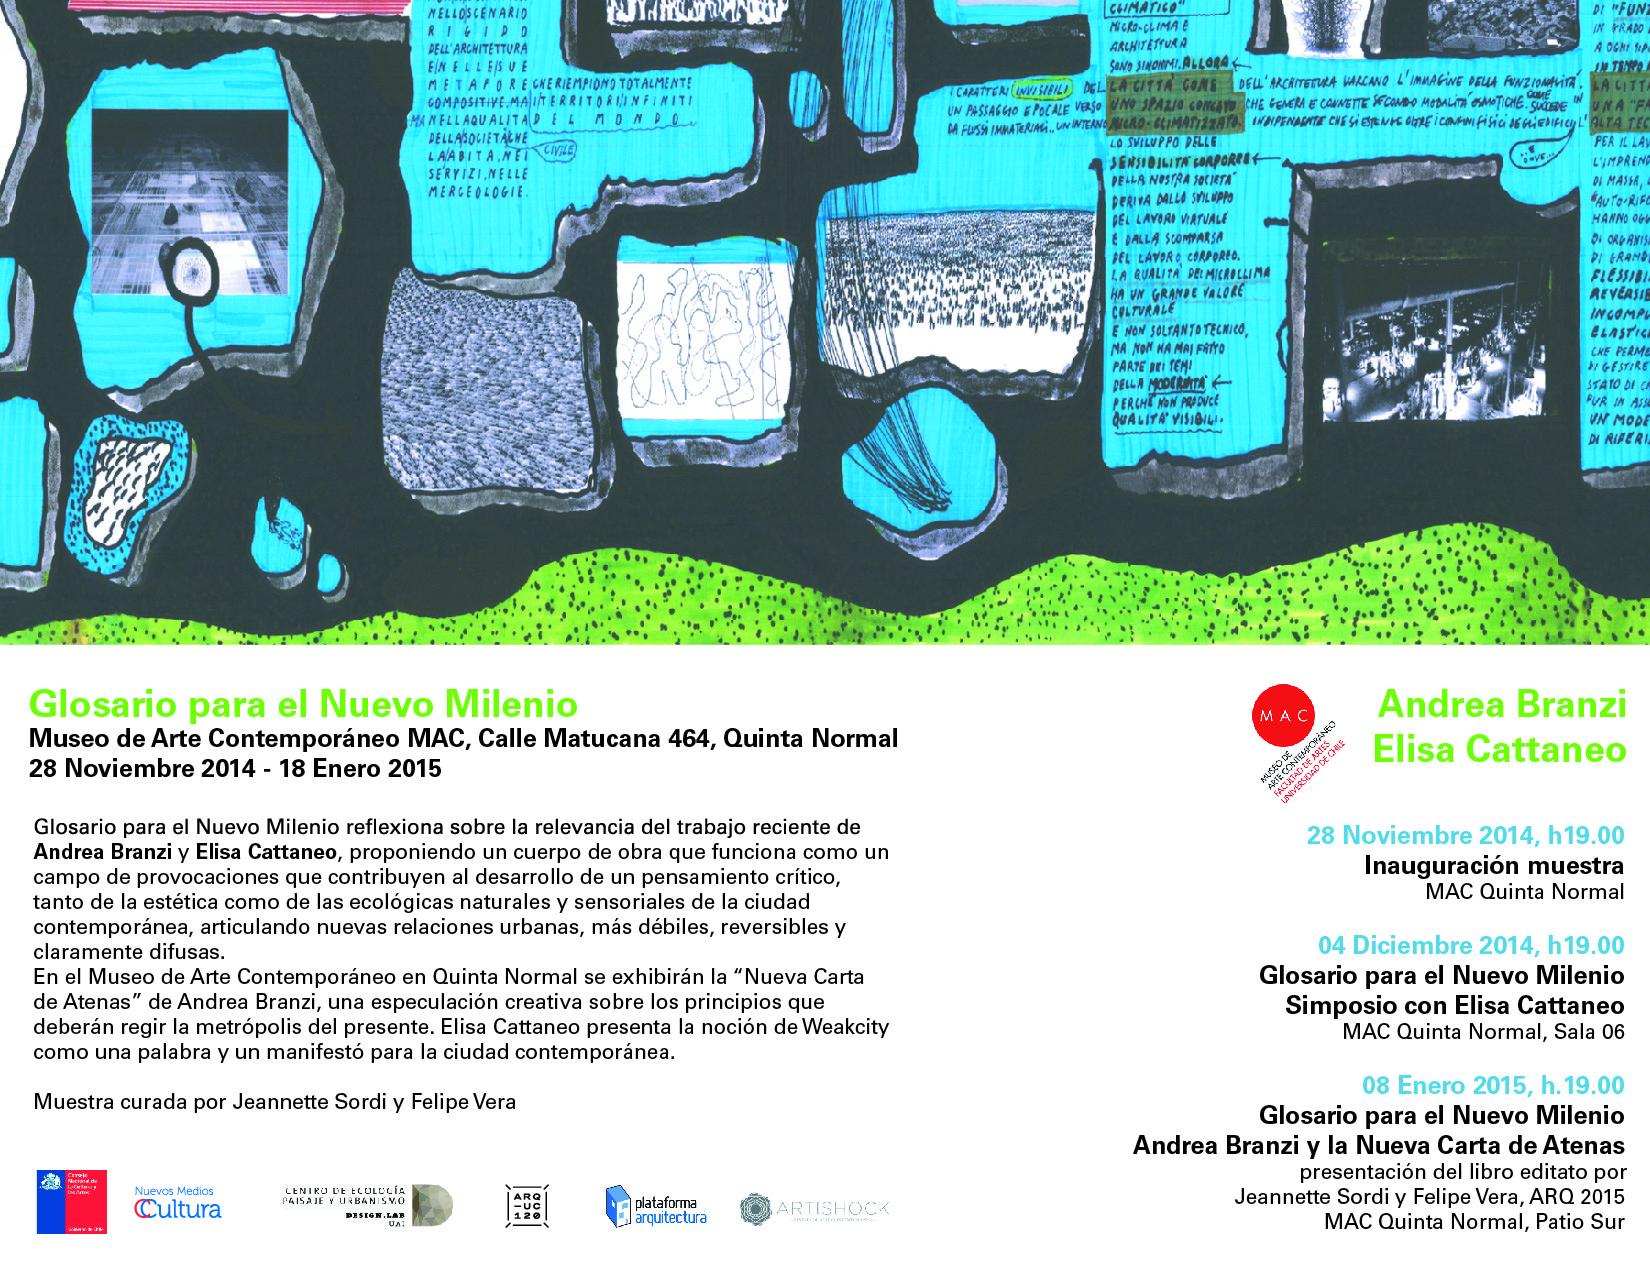 Andrea Branzi: glosario para el nuevo milenio / Santiago, Cortesia de Felipe Vera